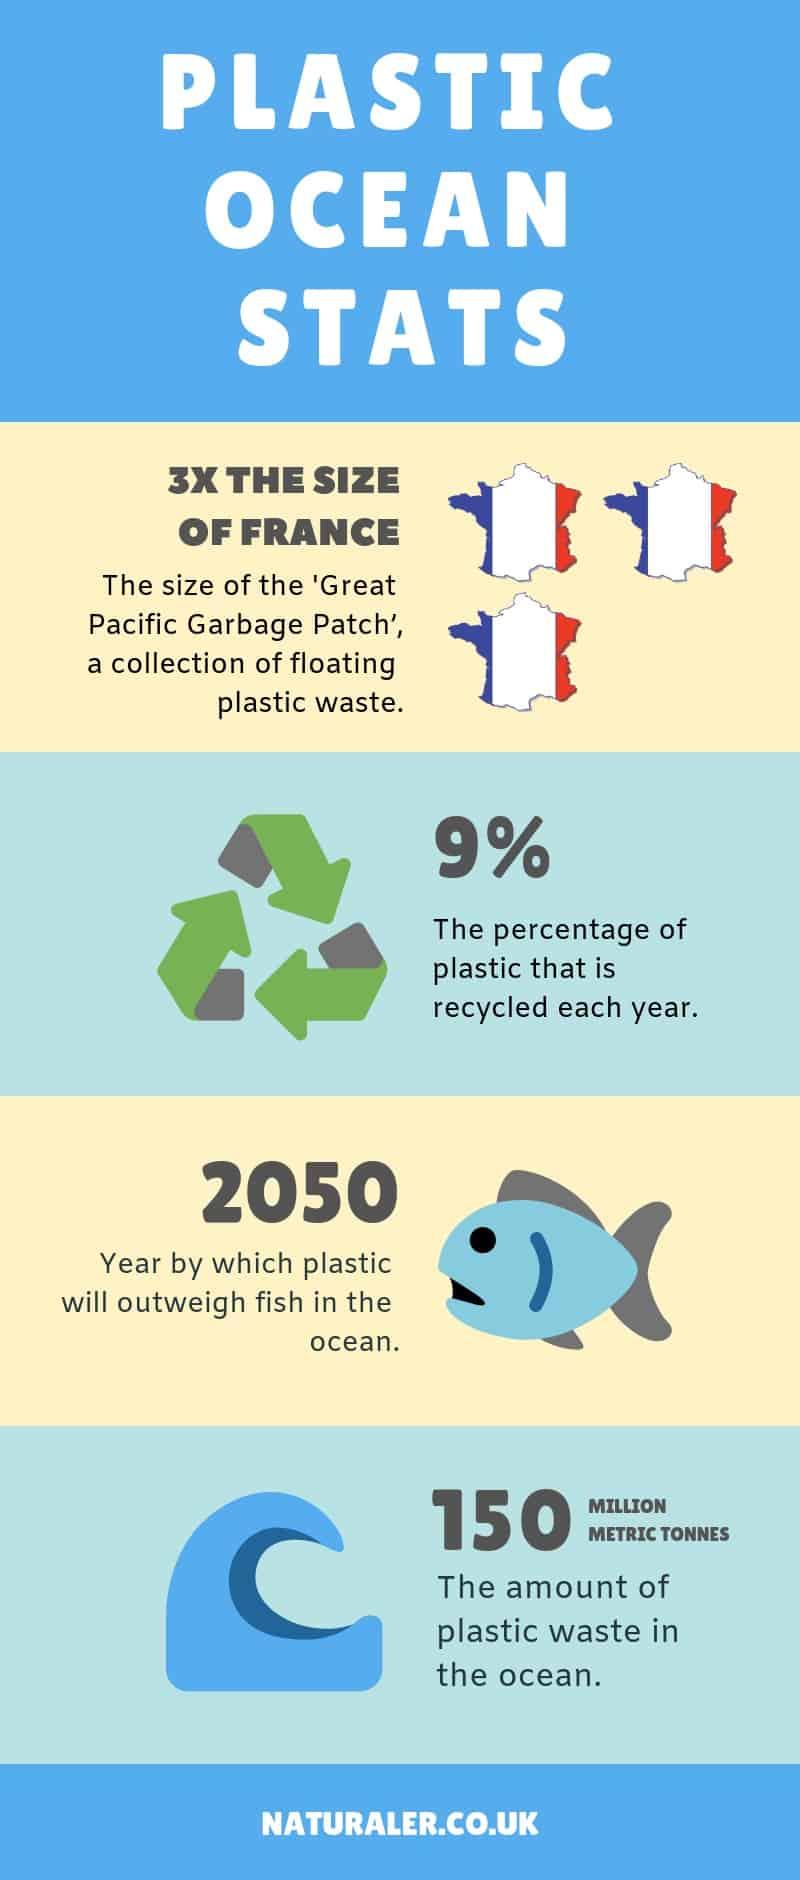 Plastic Ocean Stats Infographic